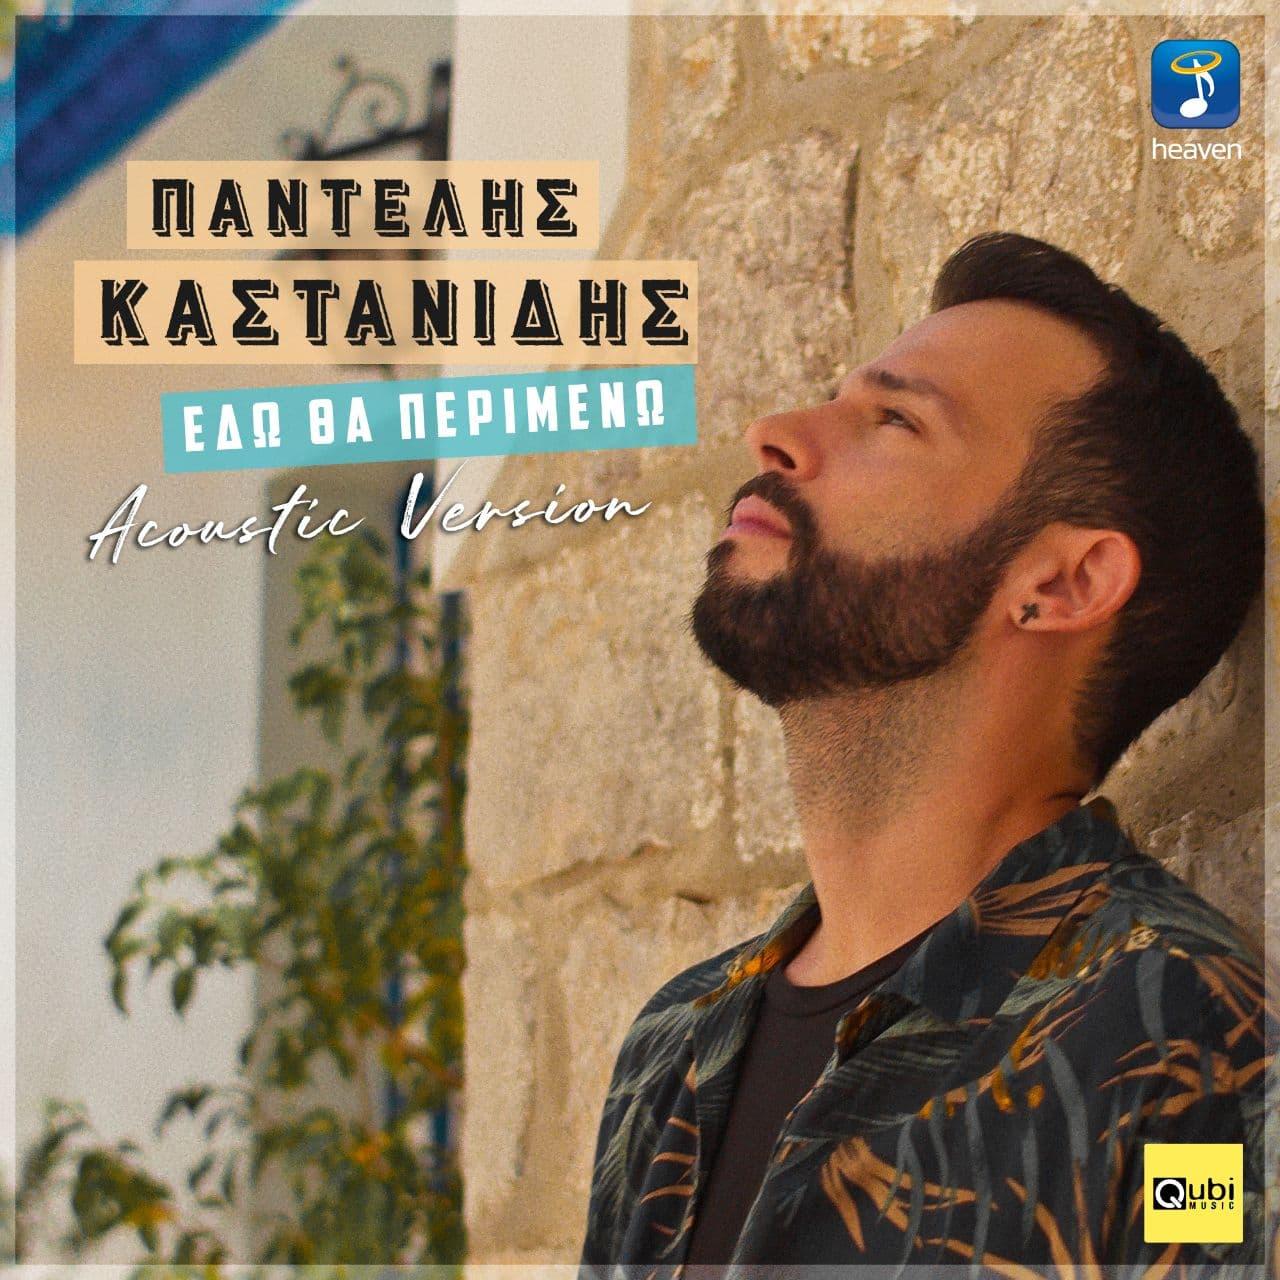 O δίσκος «Εδώ θα περιμένω» του Παντελή Καστανίδη σε acoustic version (VIDEO)